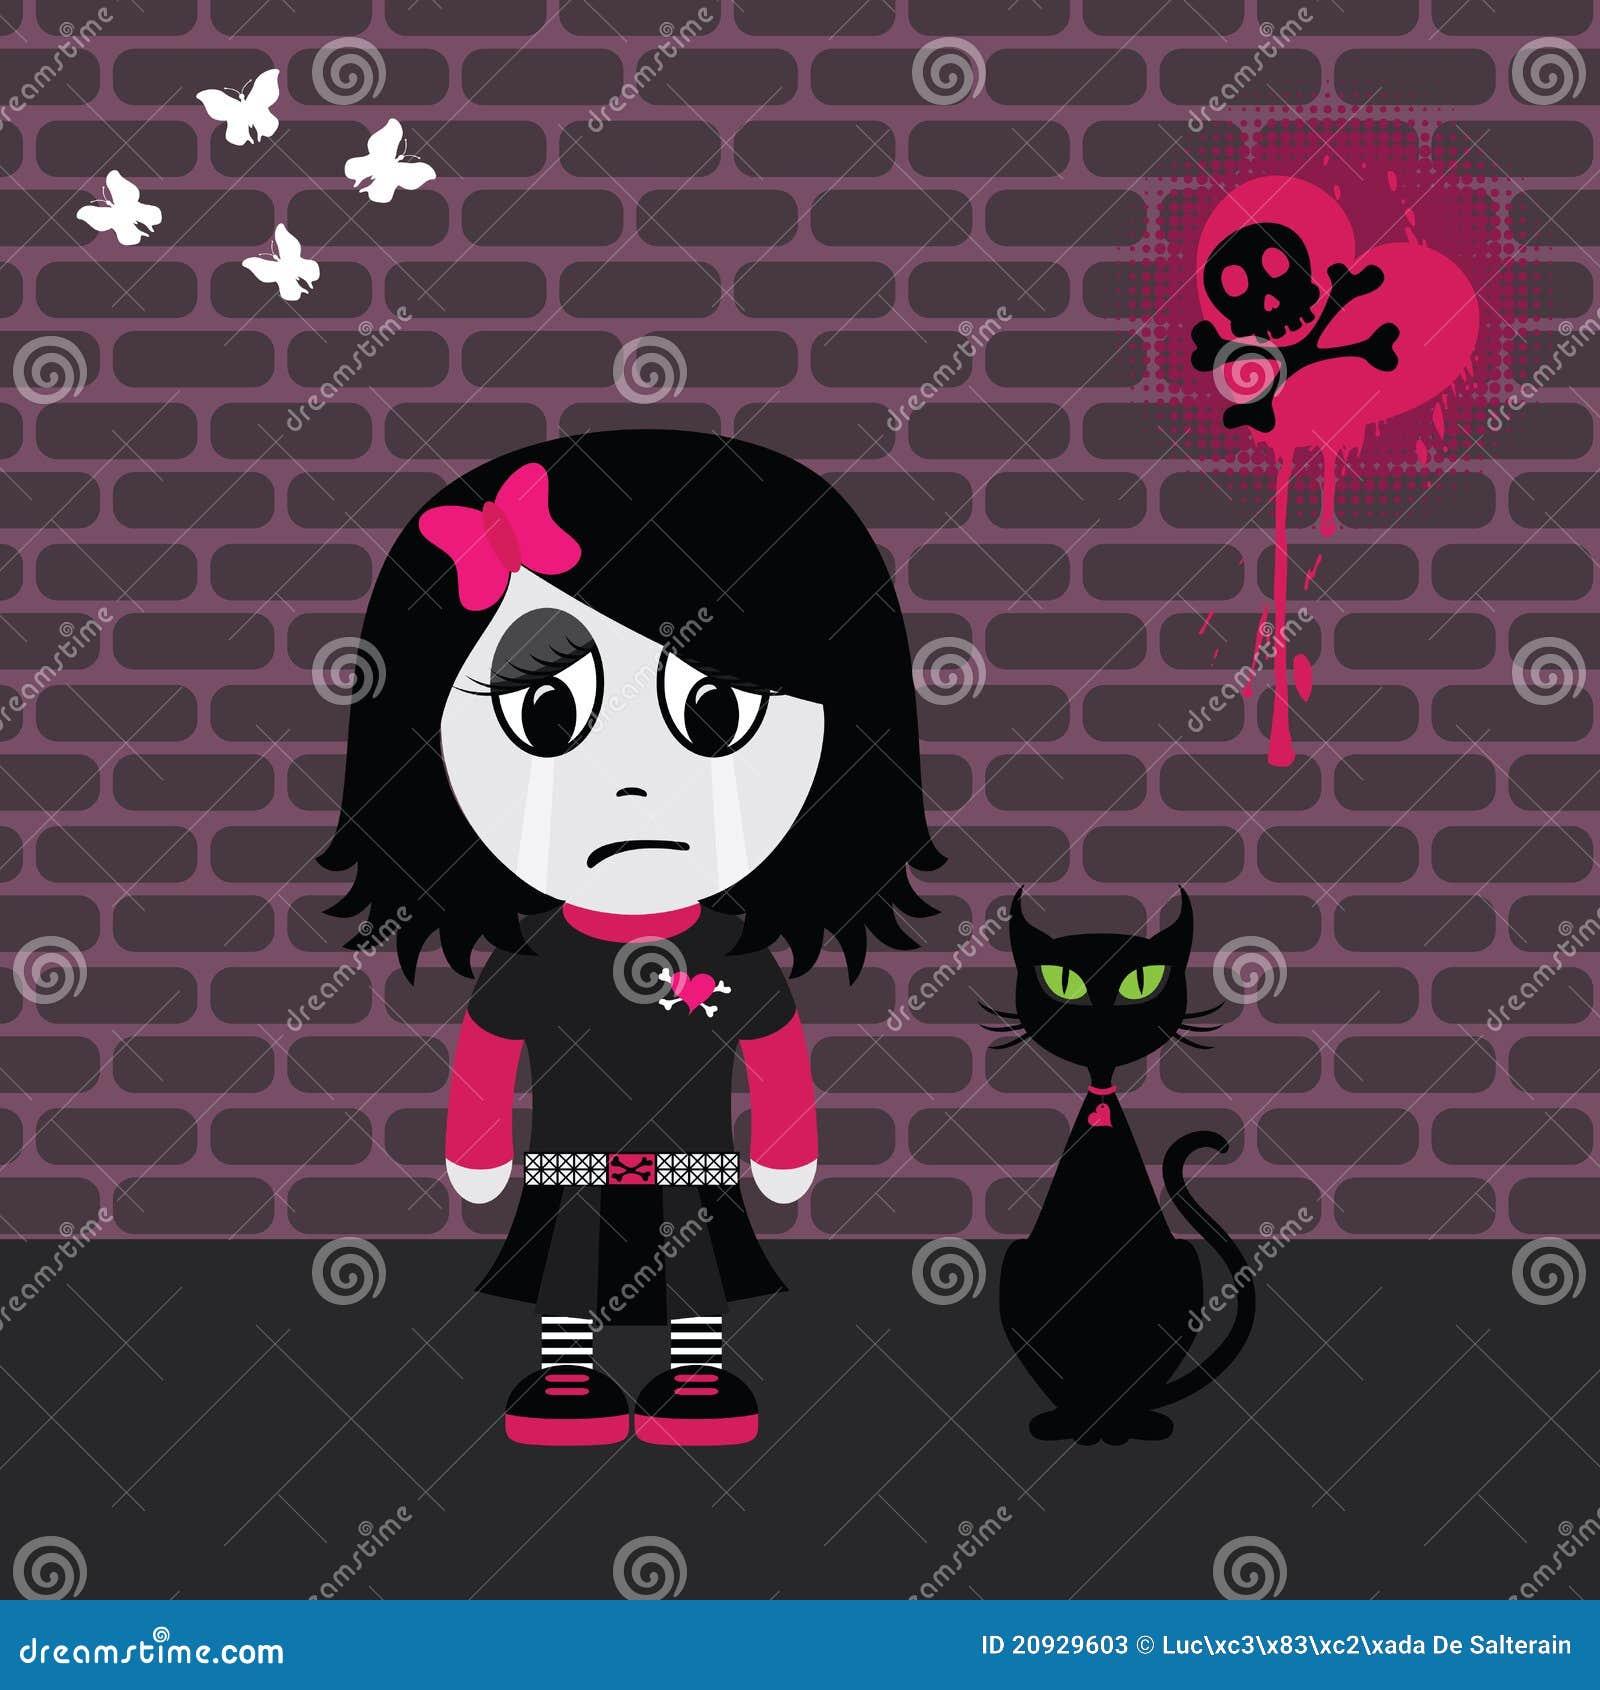 Sad Emo Girl Stock Vector Illustration Of Halftone Brick 20929603